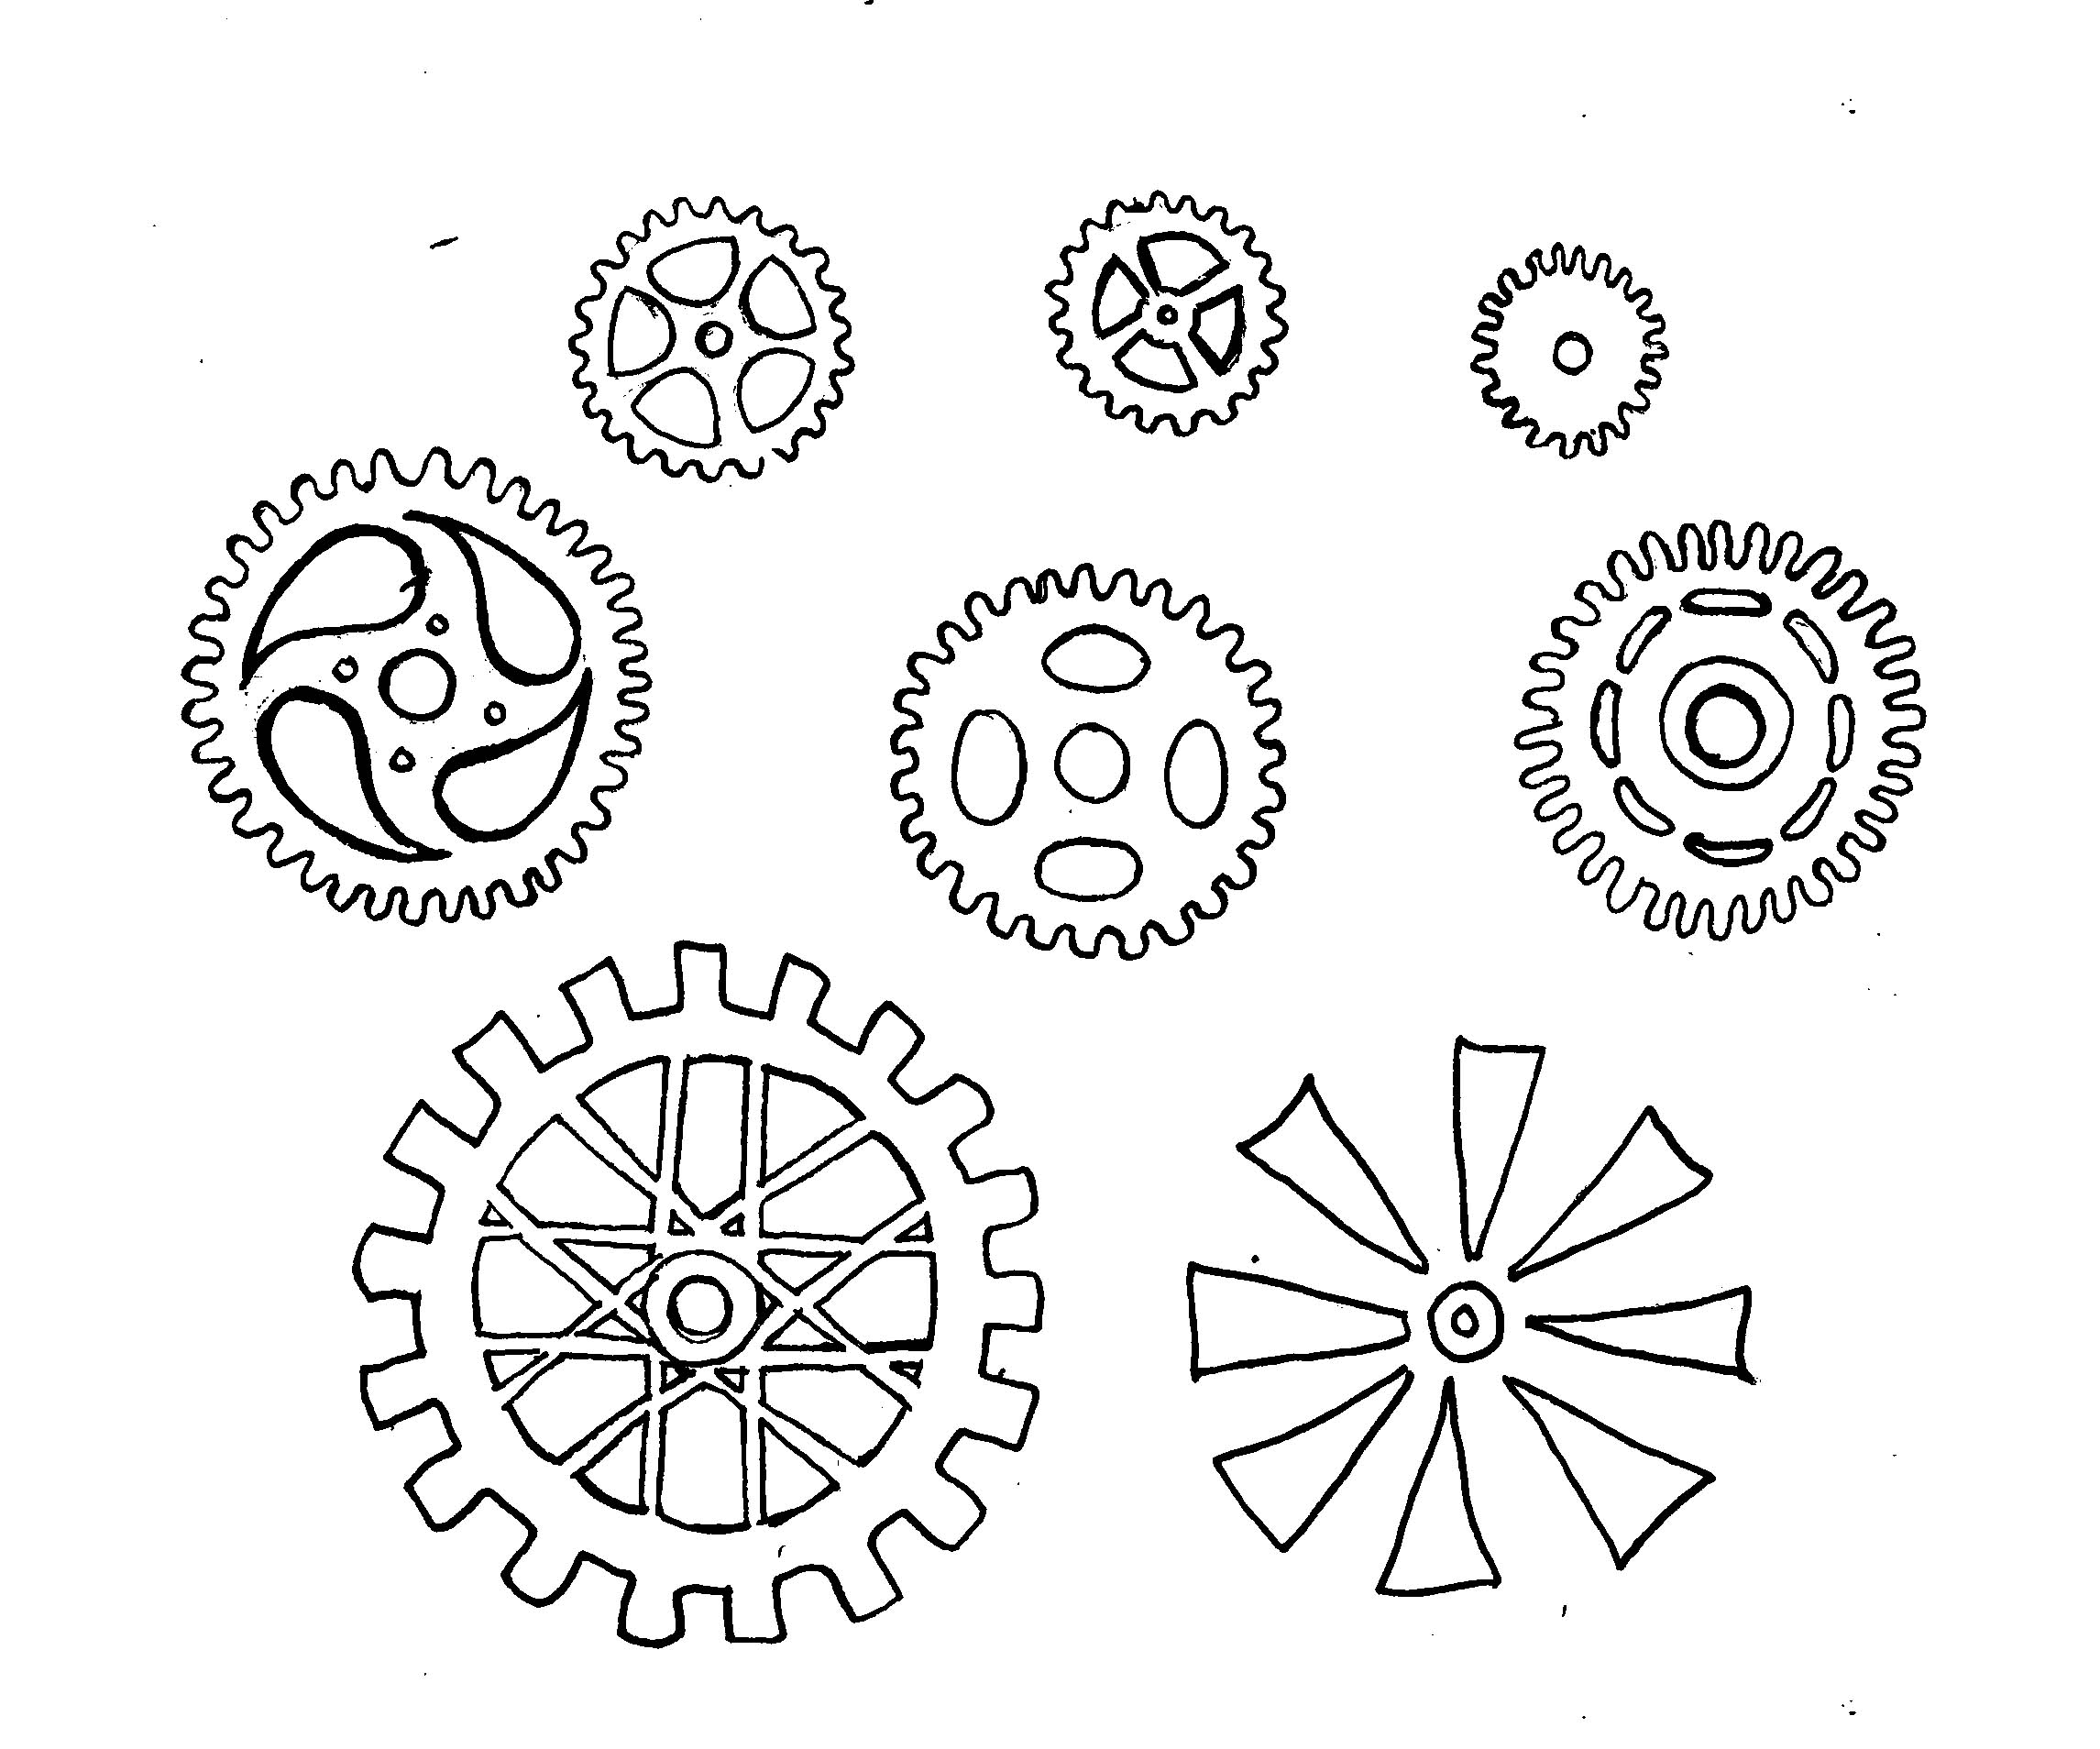 gears copy.jpg